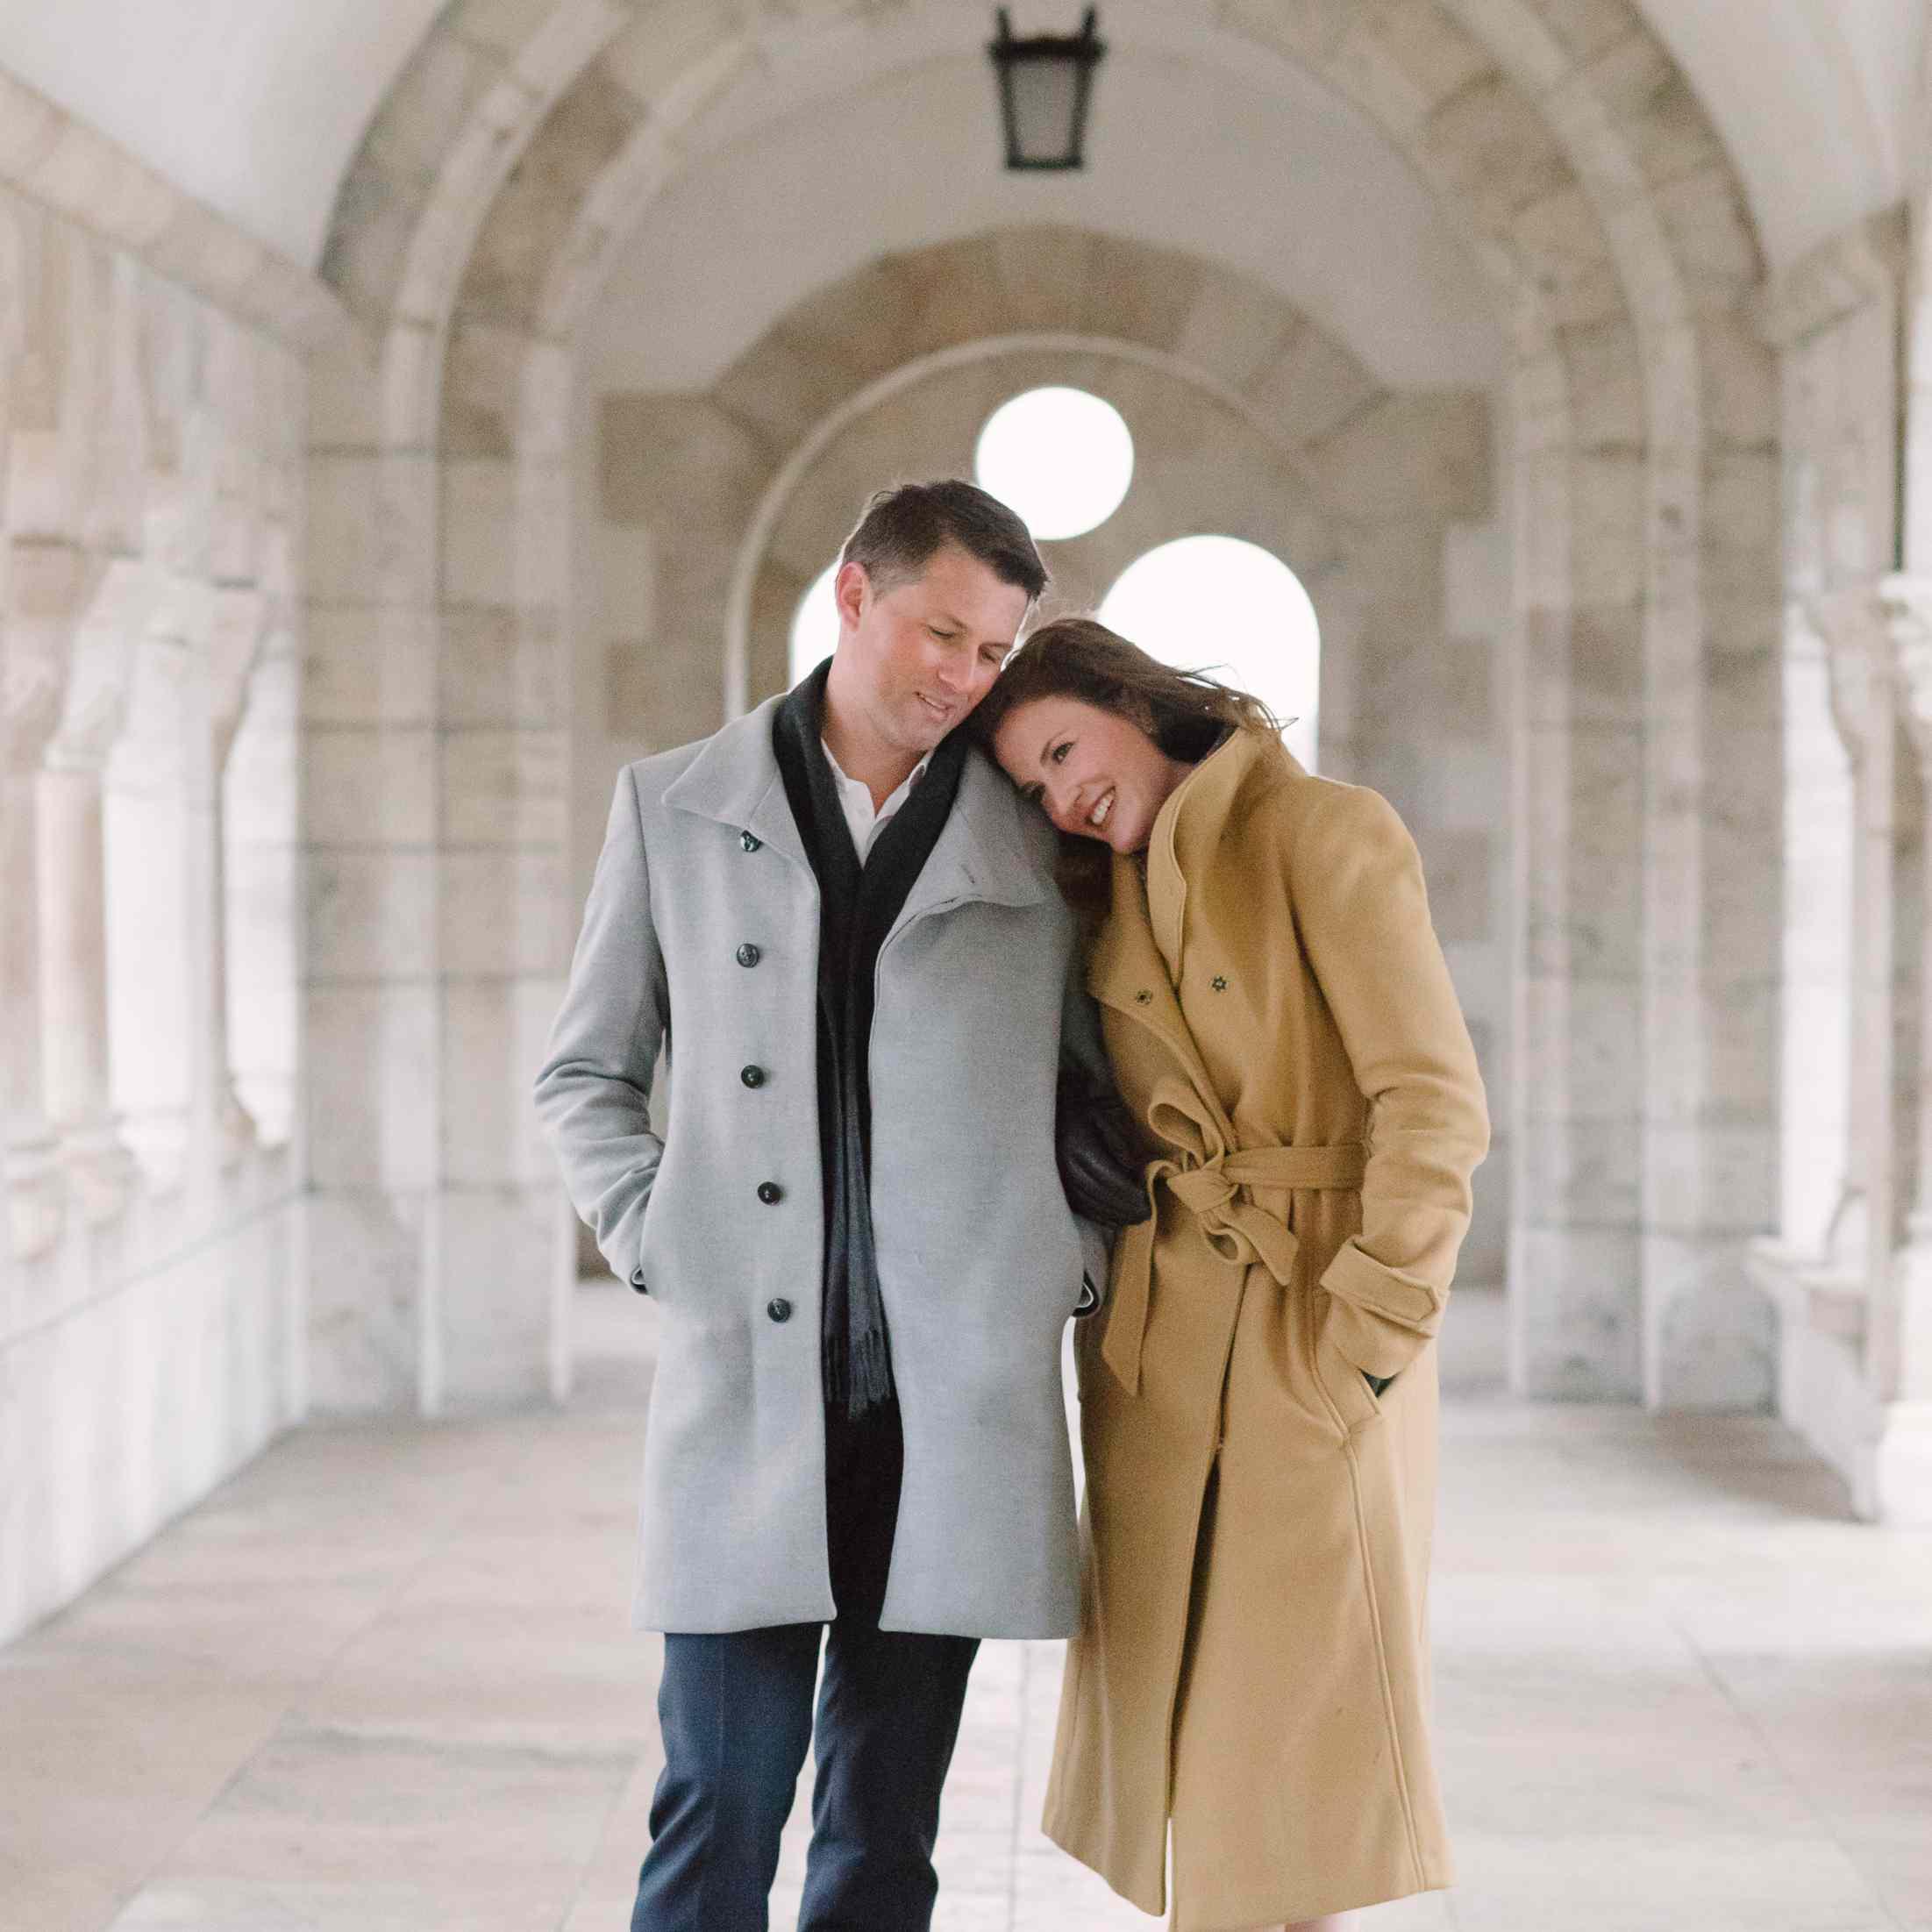 Couple hugging on their honeymoon